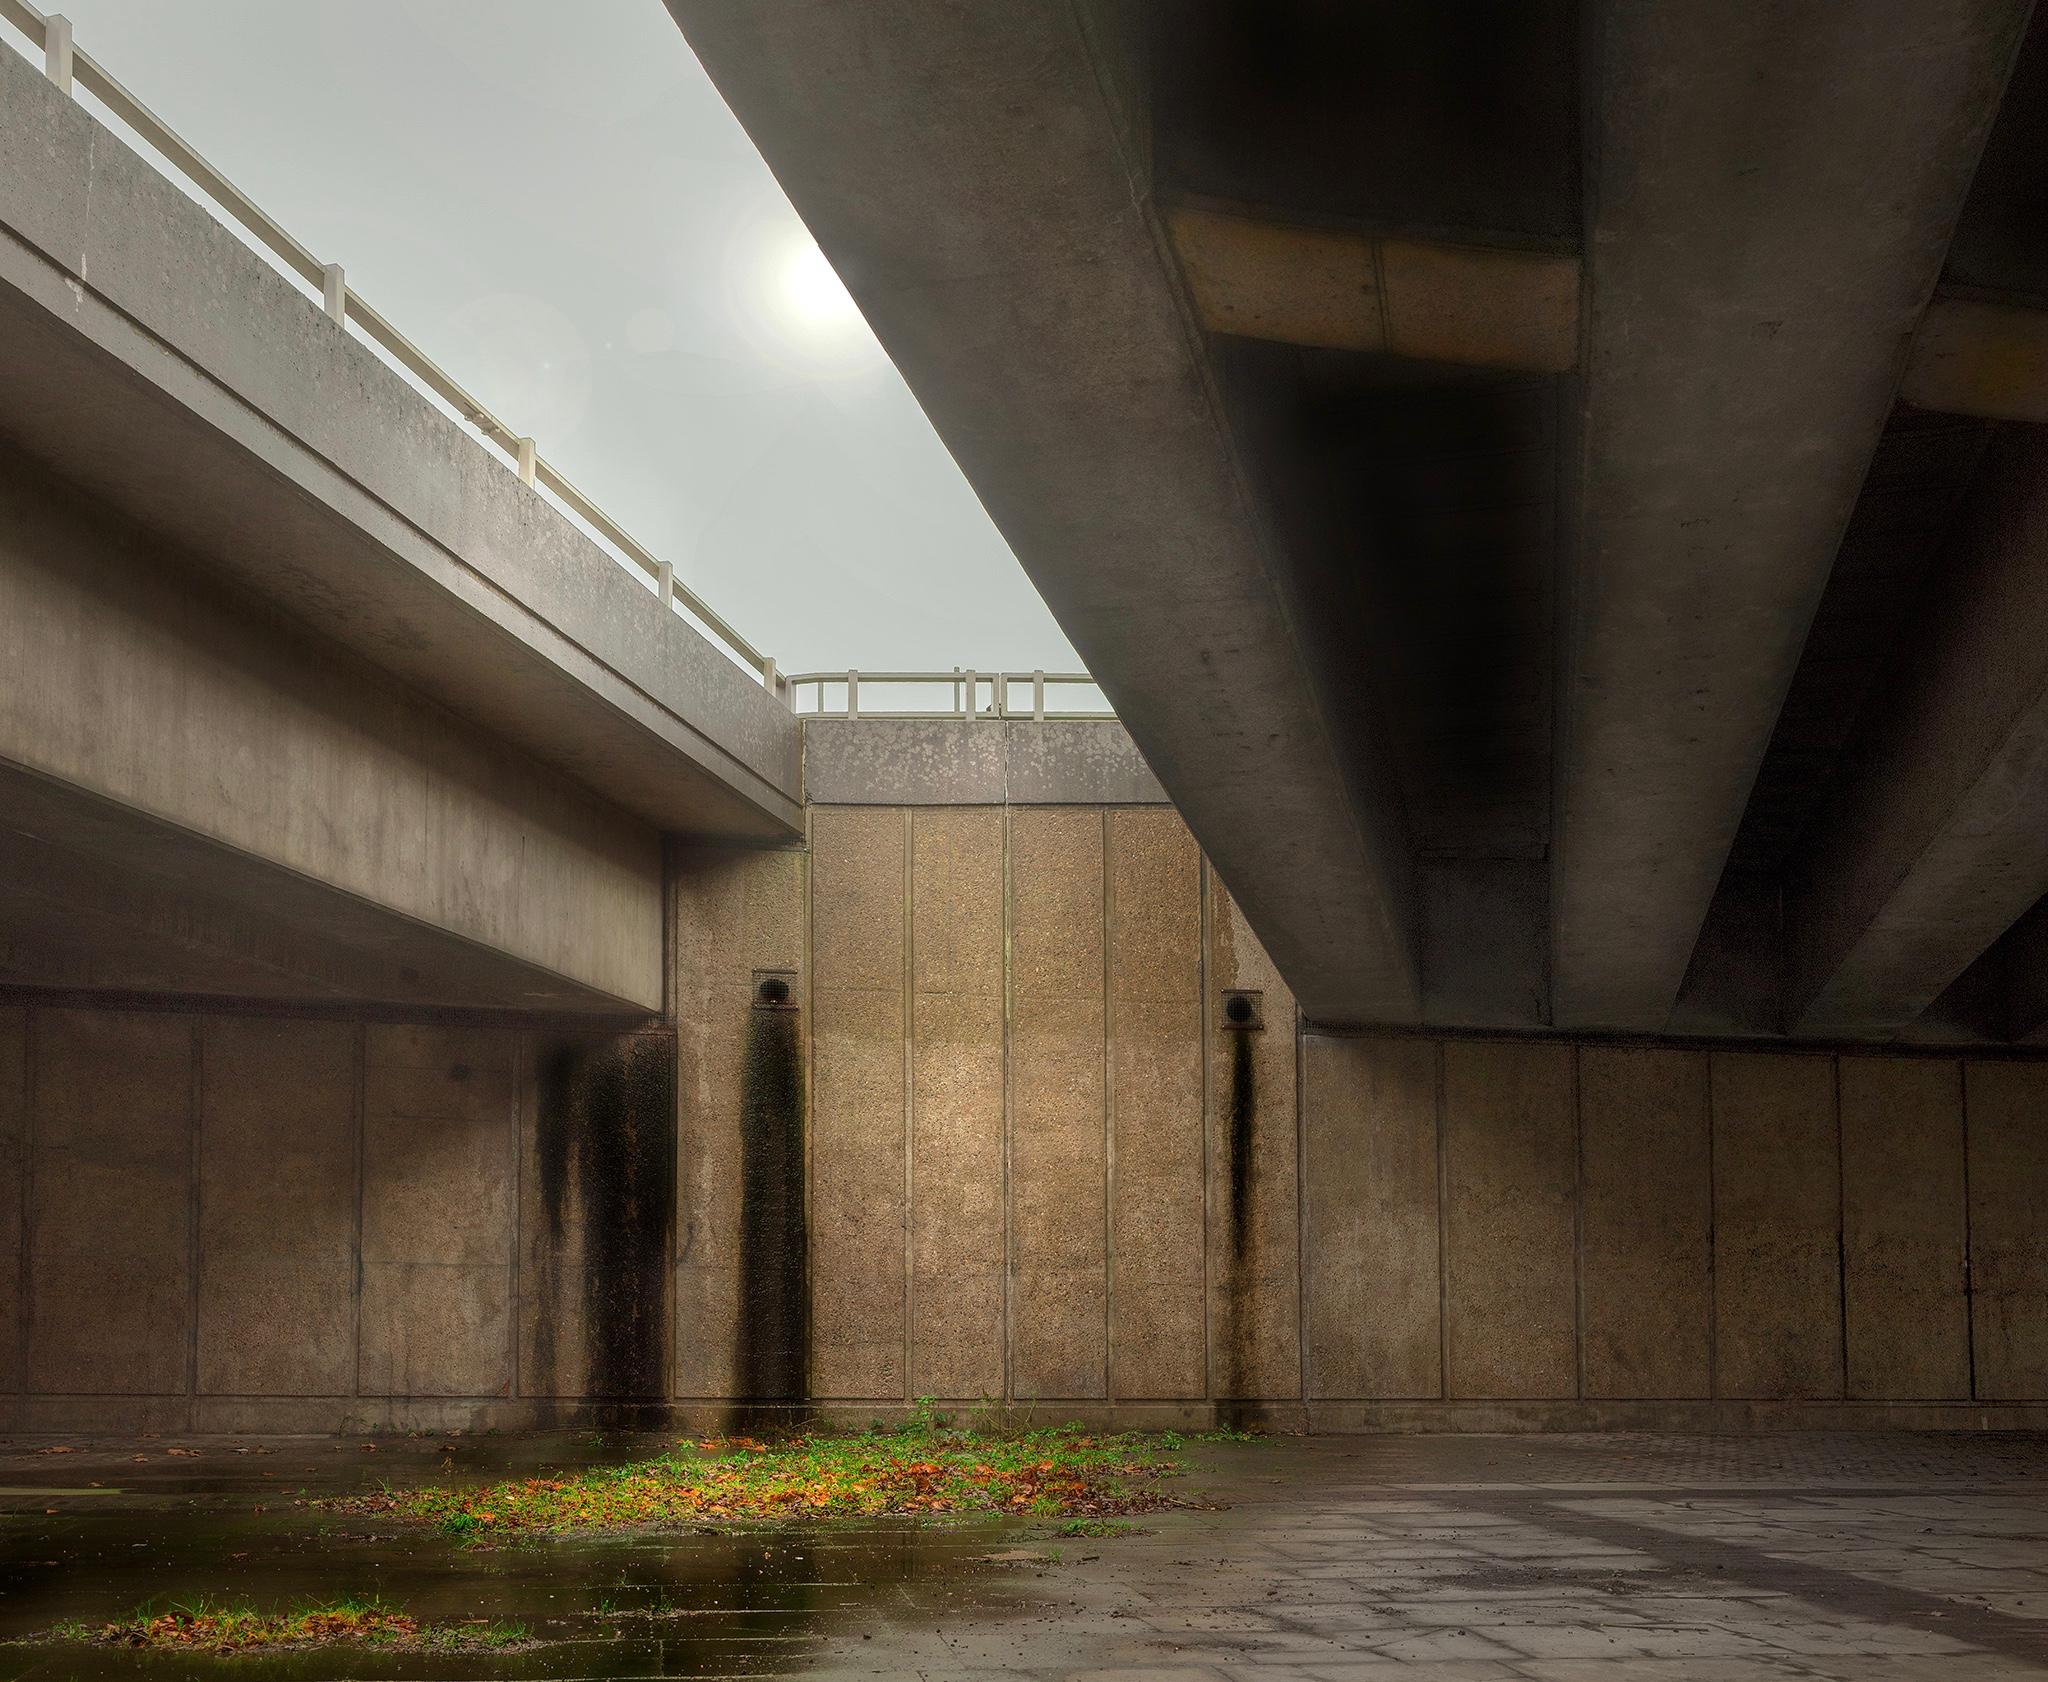 under-mabley-bridge-redo-2011.jpg